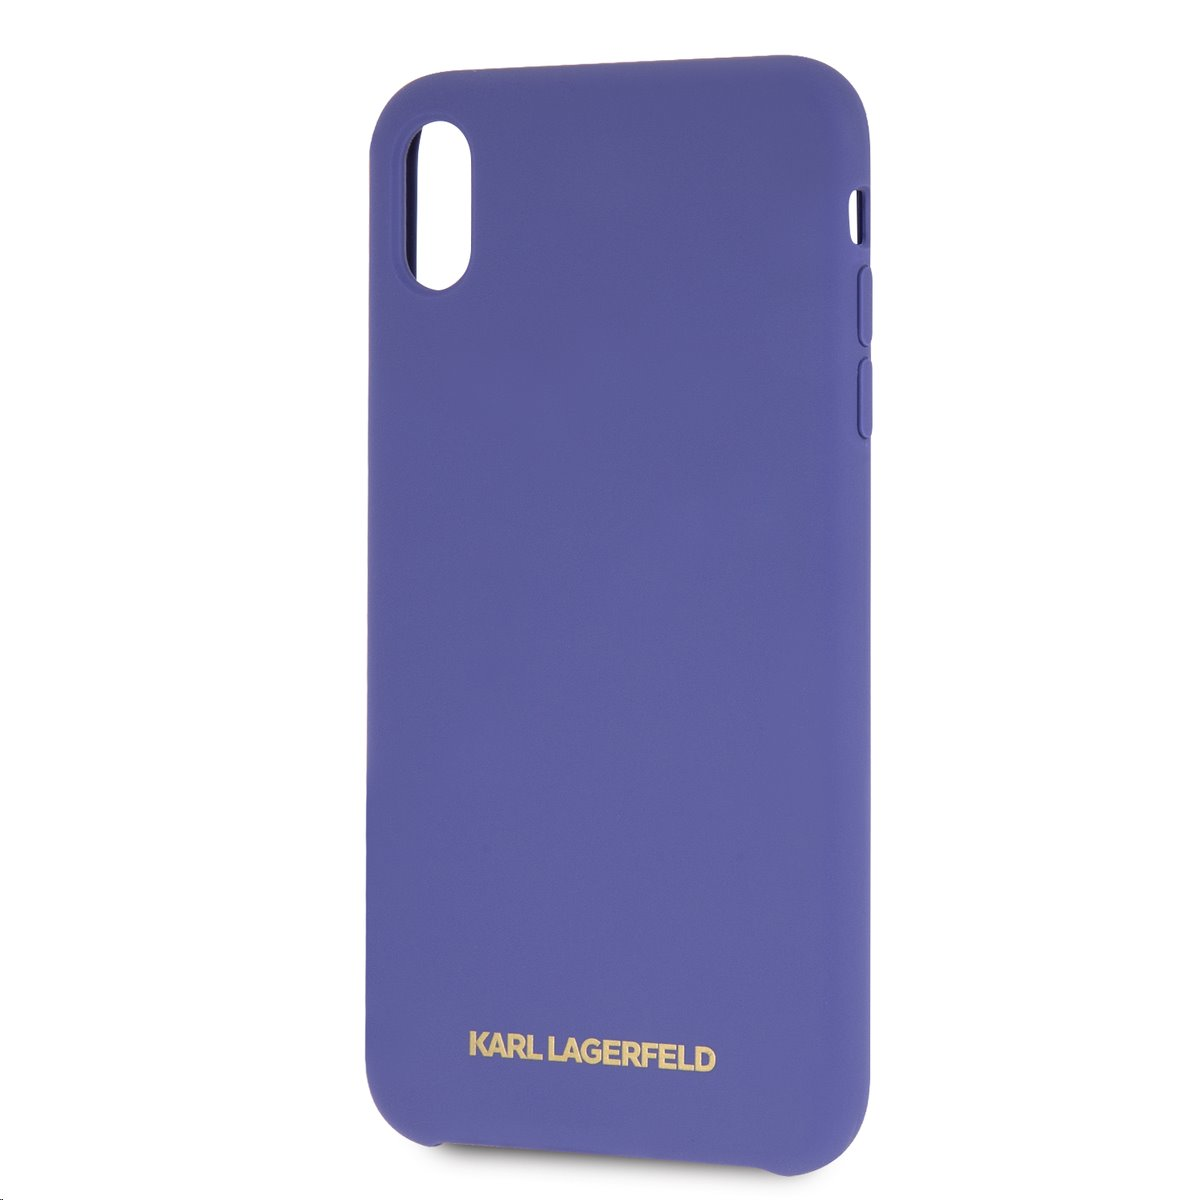 Silikonové pouzdro Karl Lagerfeld Gold Logo Silicone Case iPhone XS Max,violet